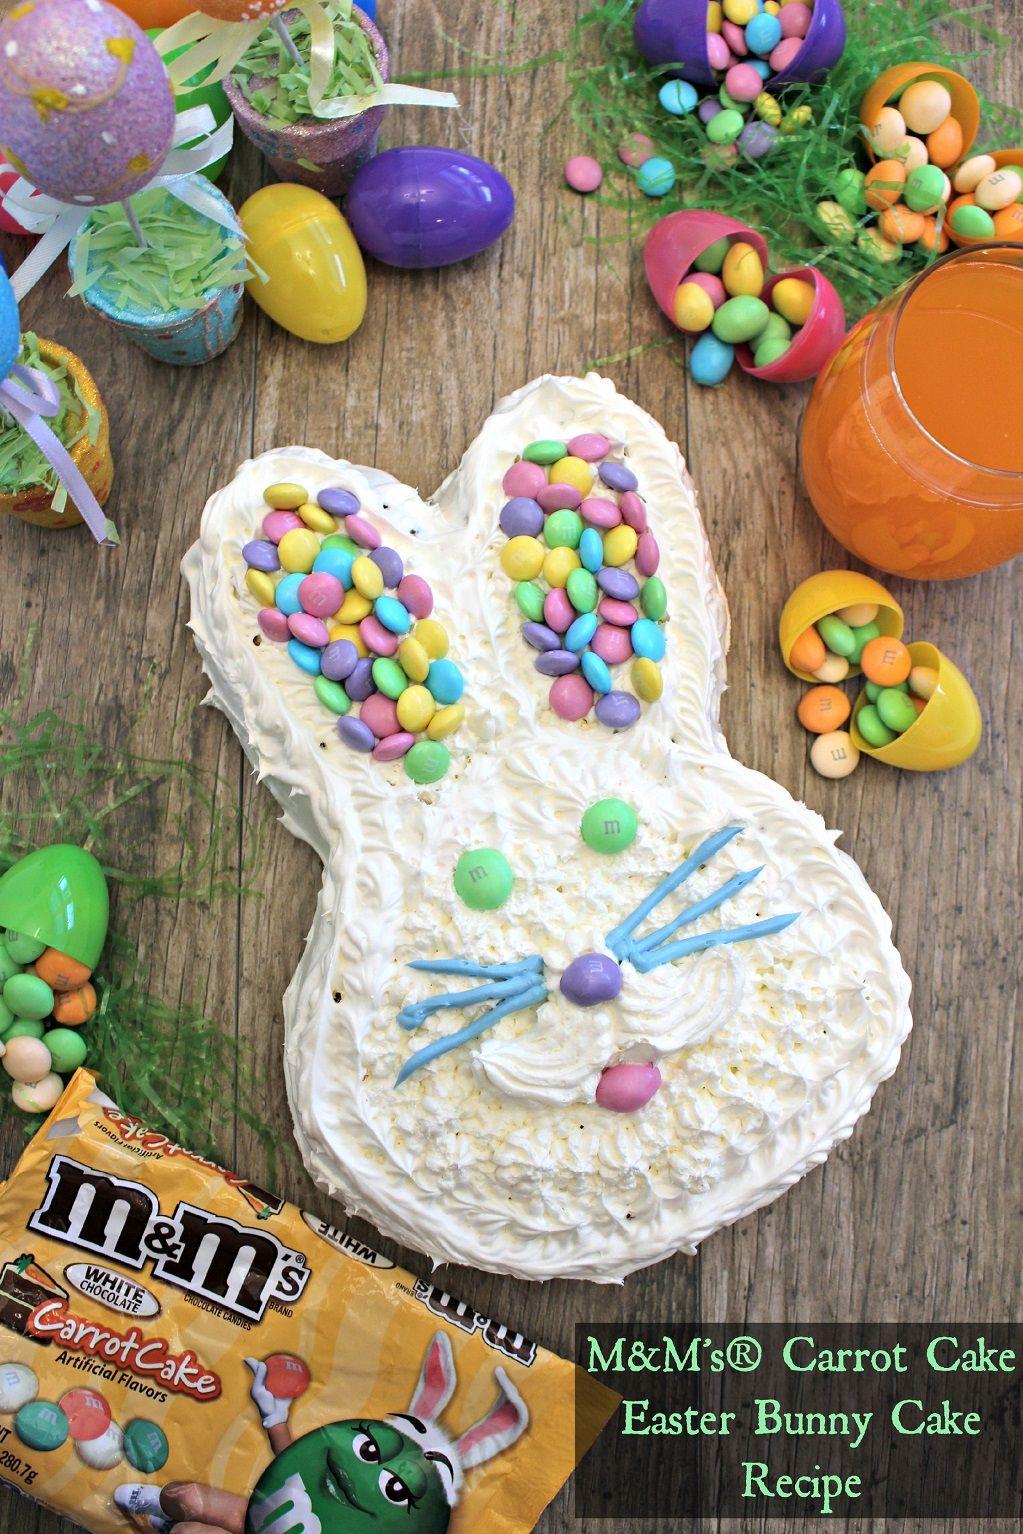 M&M's® Carrot Cake Easter Bunny Cake | Recipe | Easter bunny cake ...